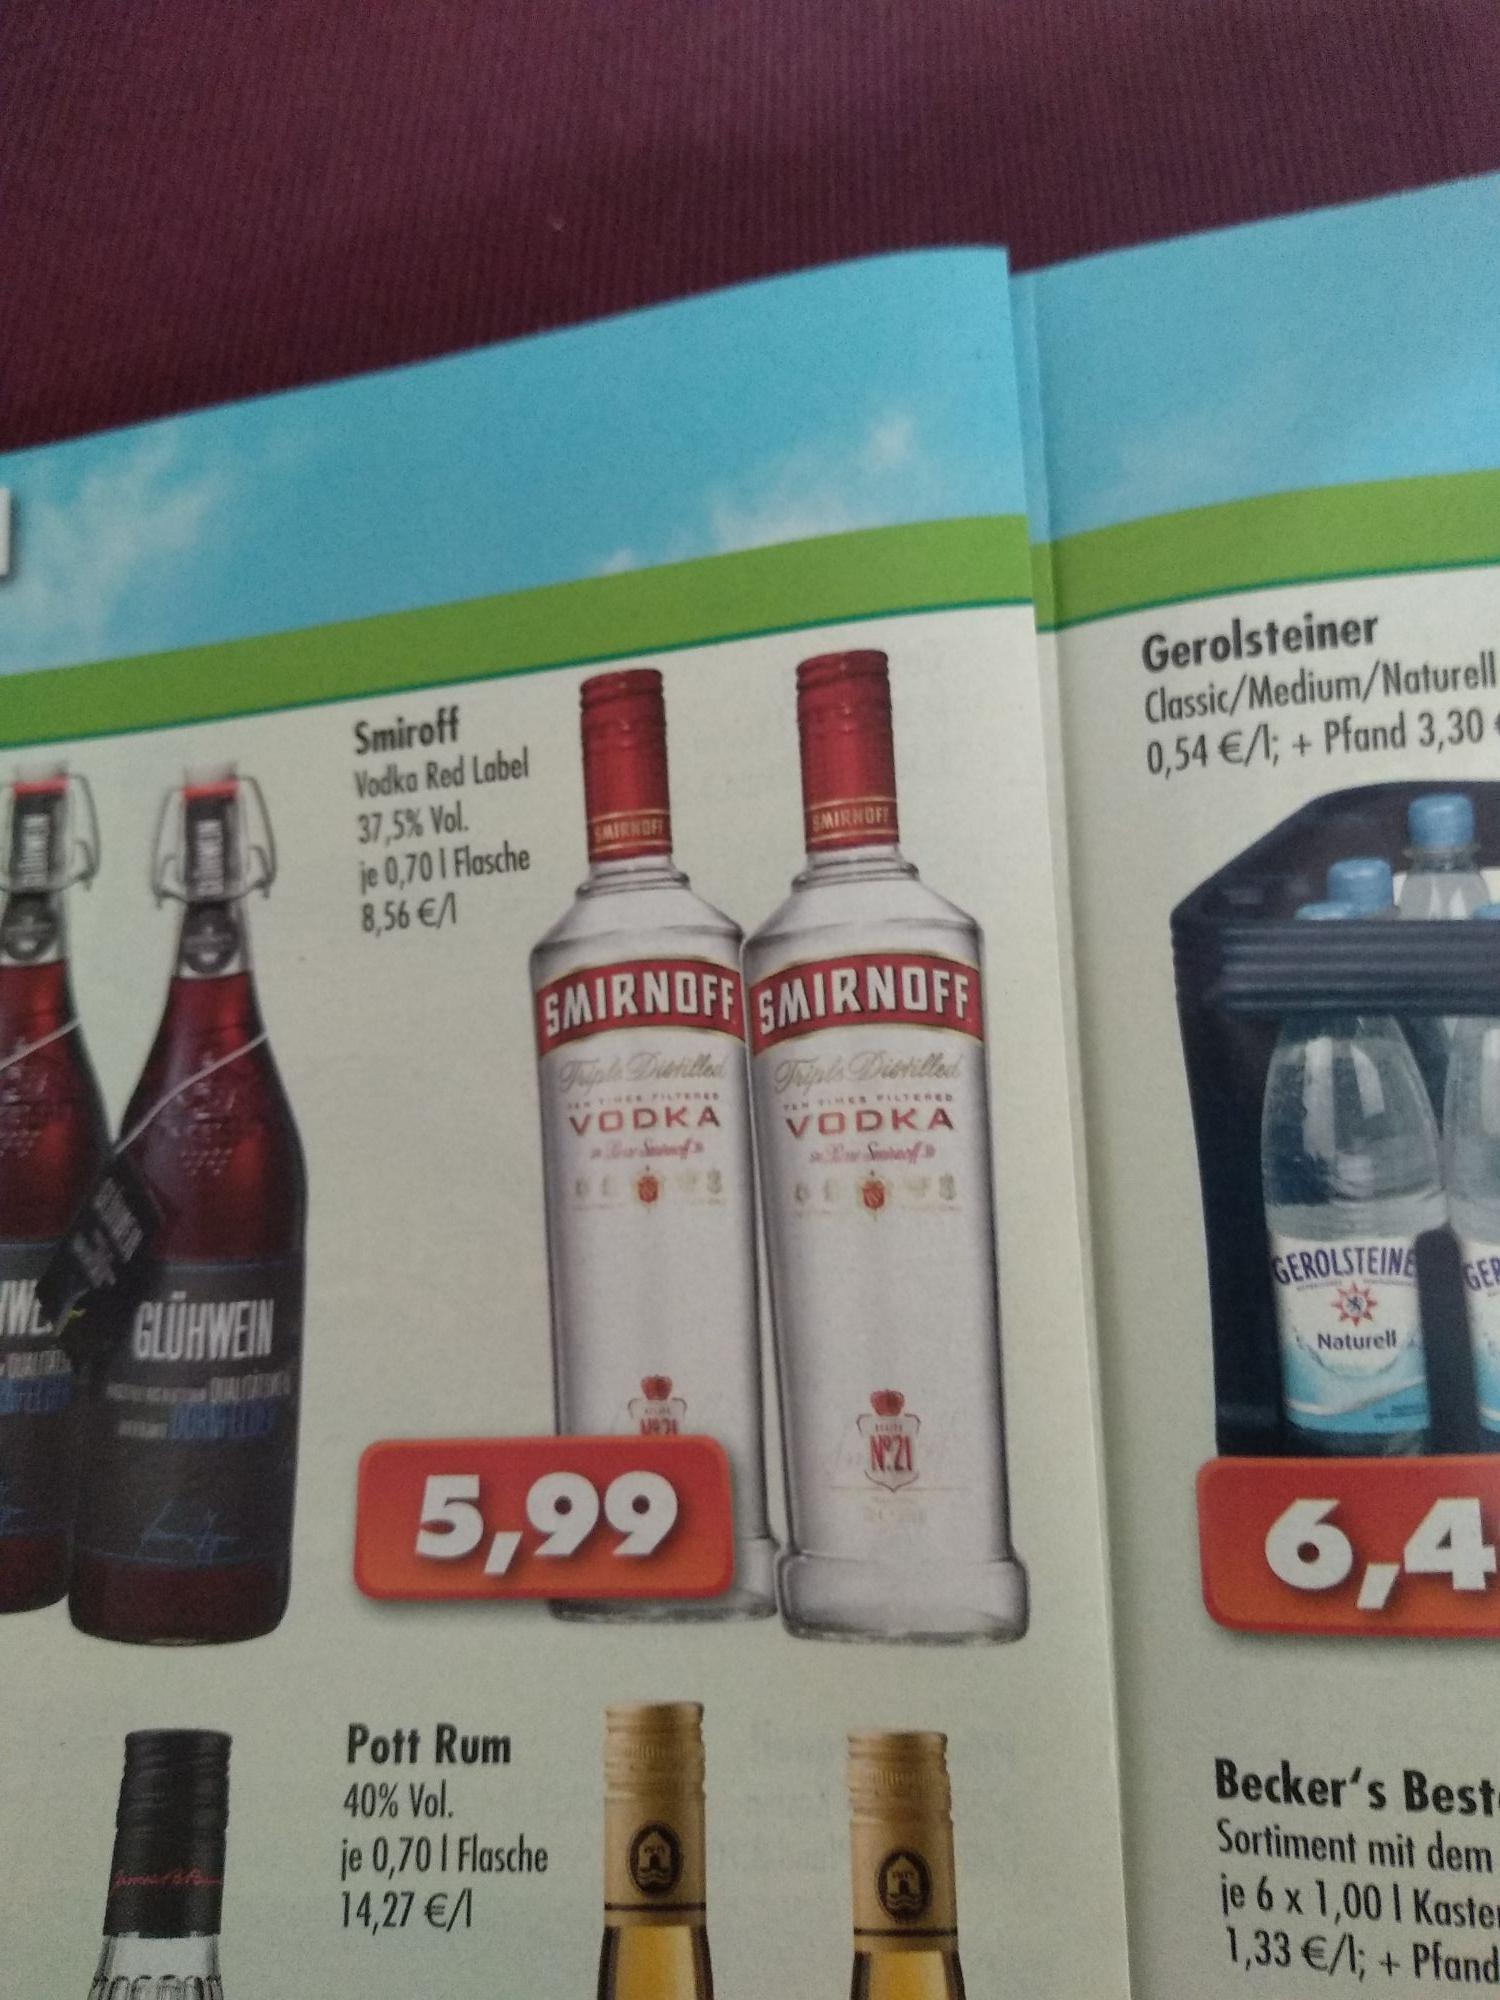 (Lokal OWL) Smirnoff Vodka 0,7l Flasche